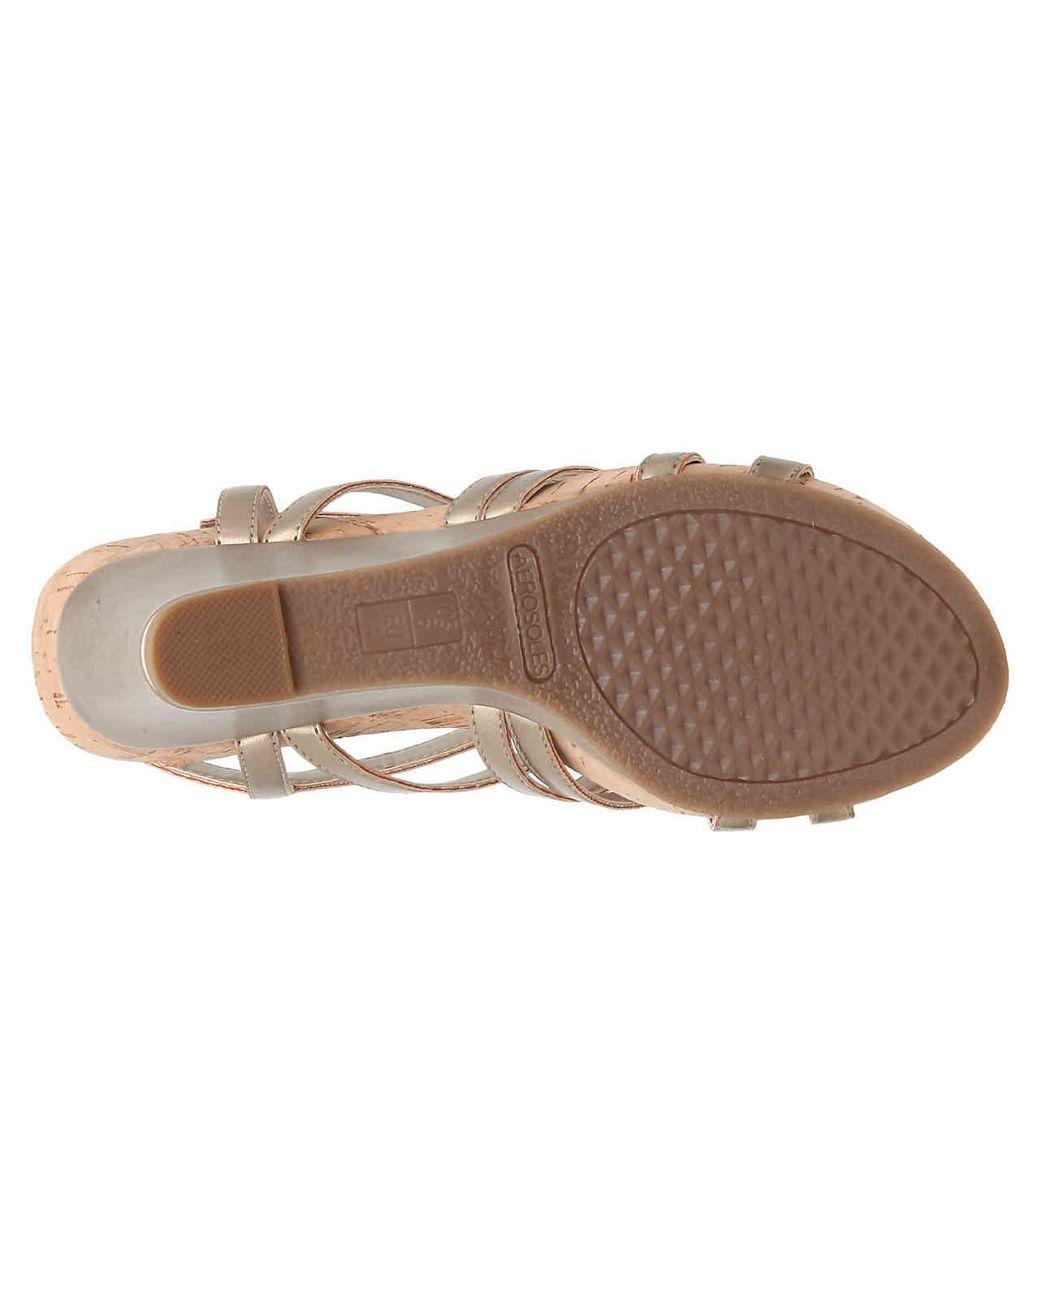 ea1707e75d2 Lyst - Aerosoles Lux Plush Wedge Sandal in Metallic